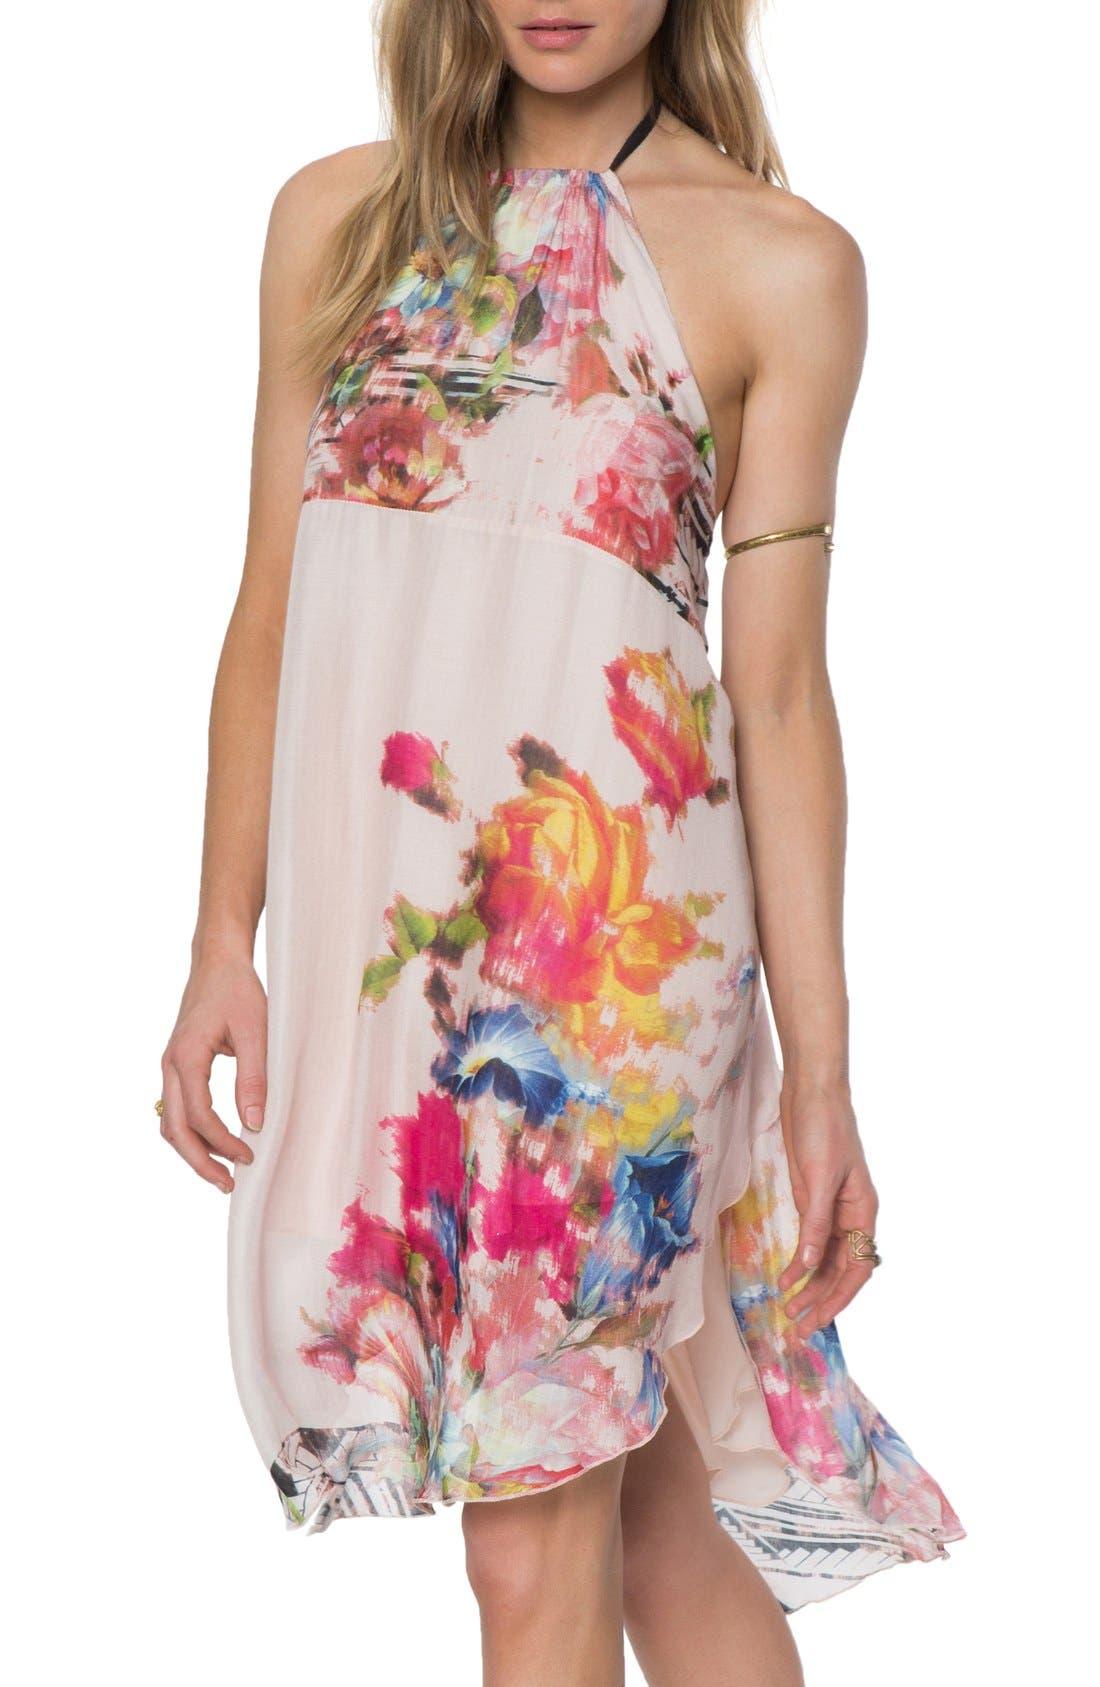 Alternate Image 1 Selected - O'Neill 'Rosette' Mixed Print Halter Dress